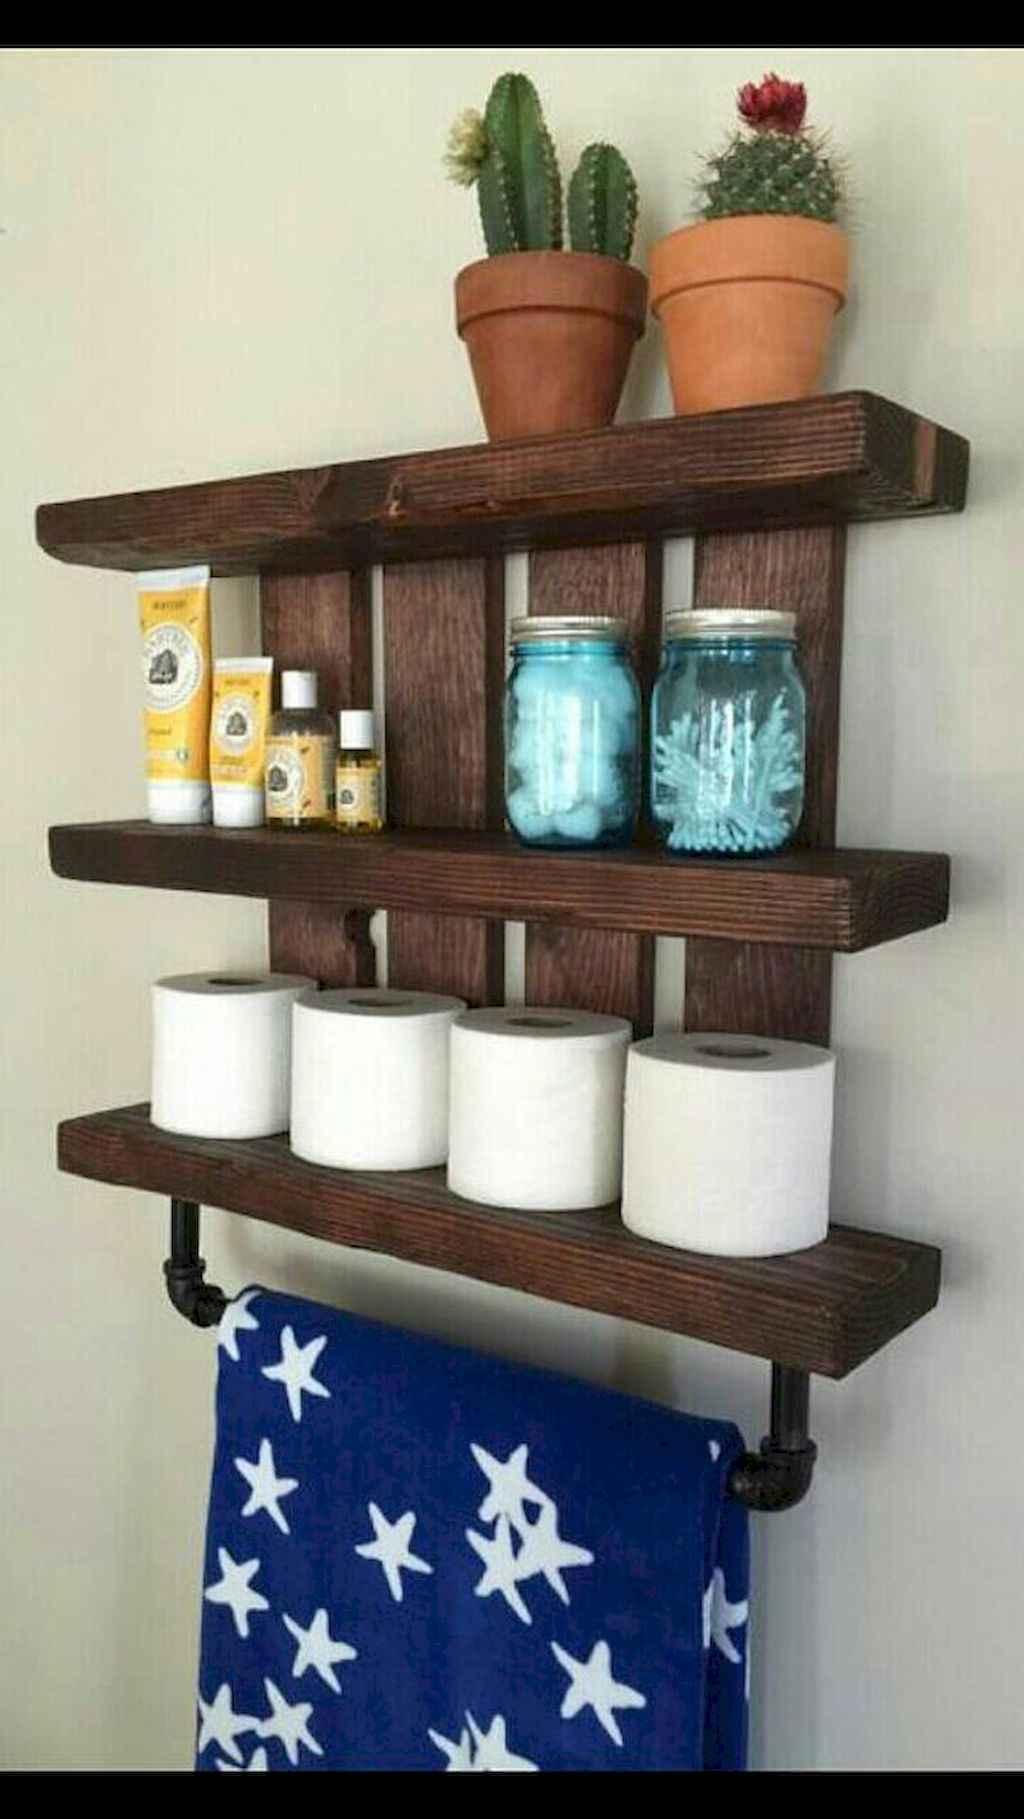 Cool bathroom storage shelves organization ideas (4)